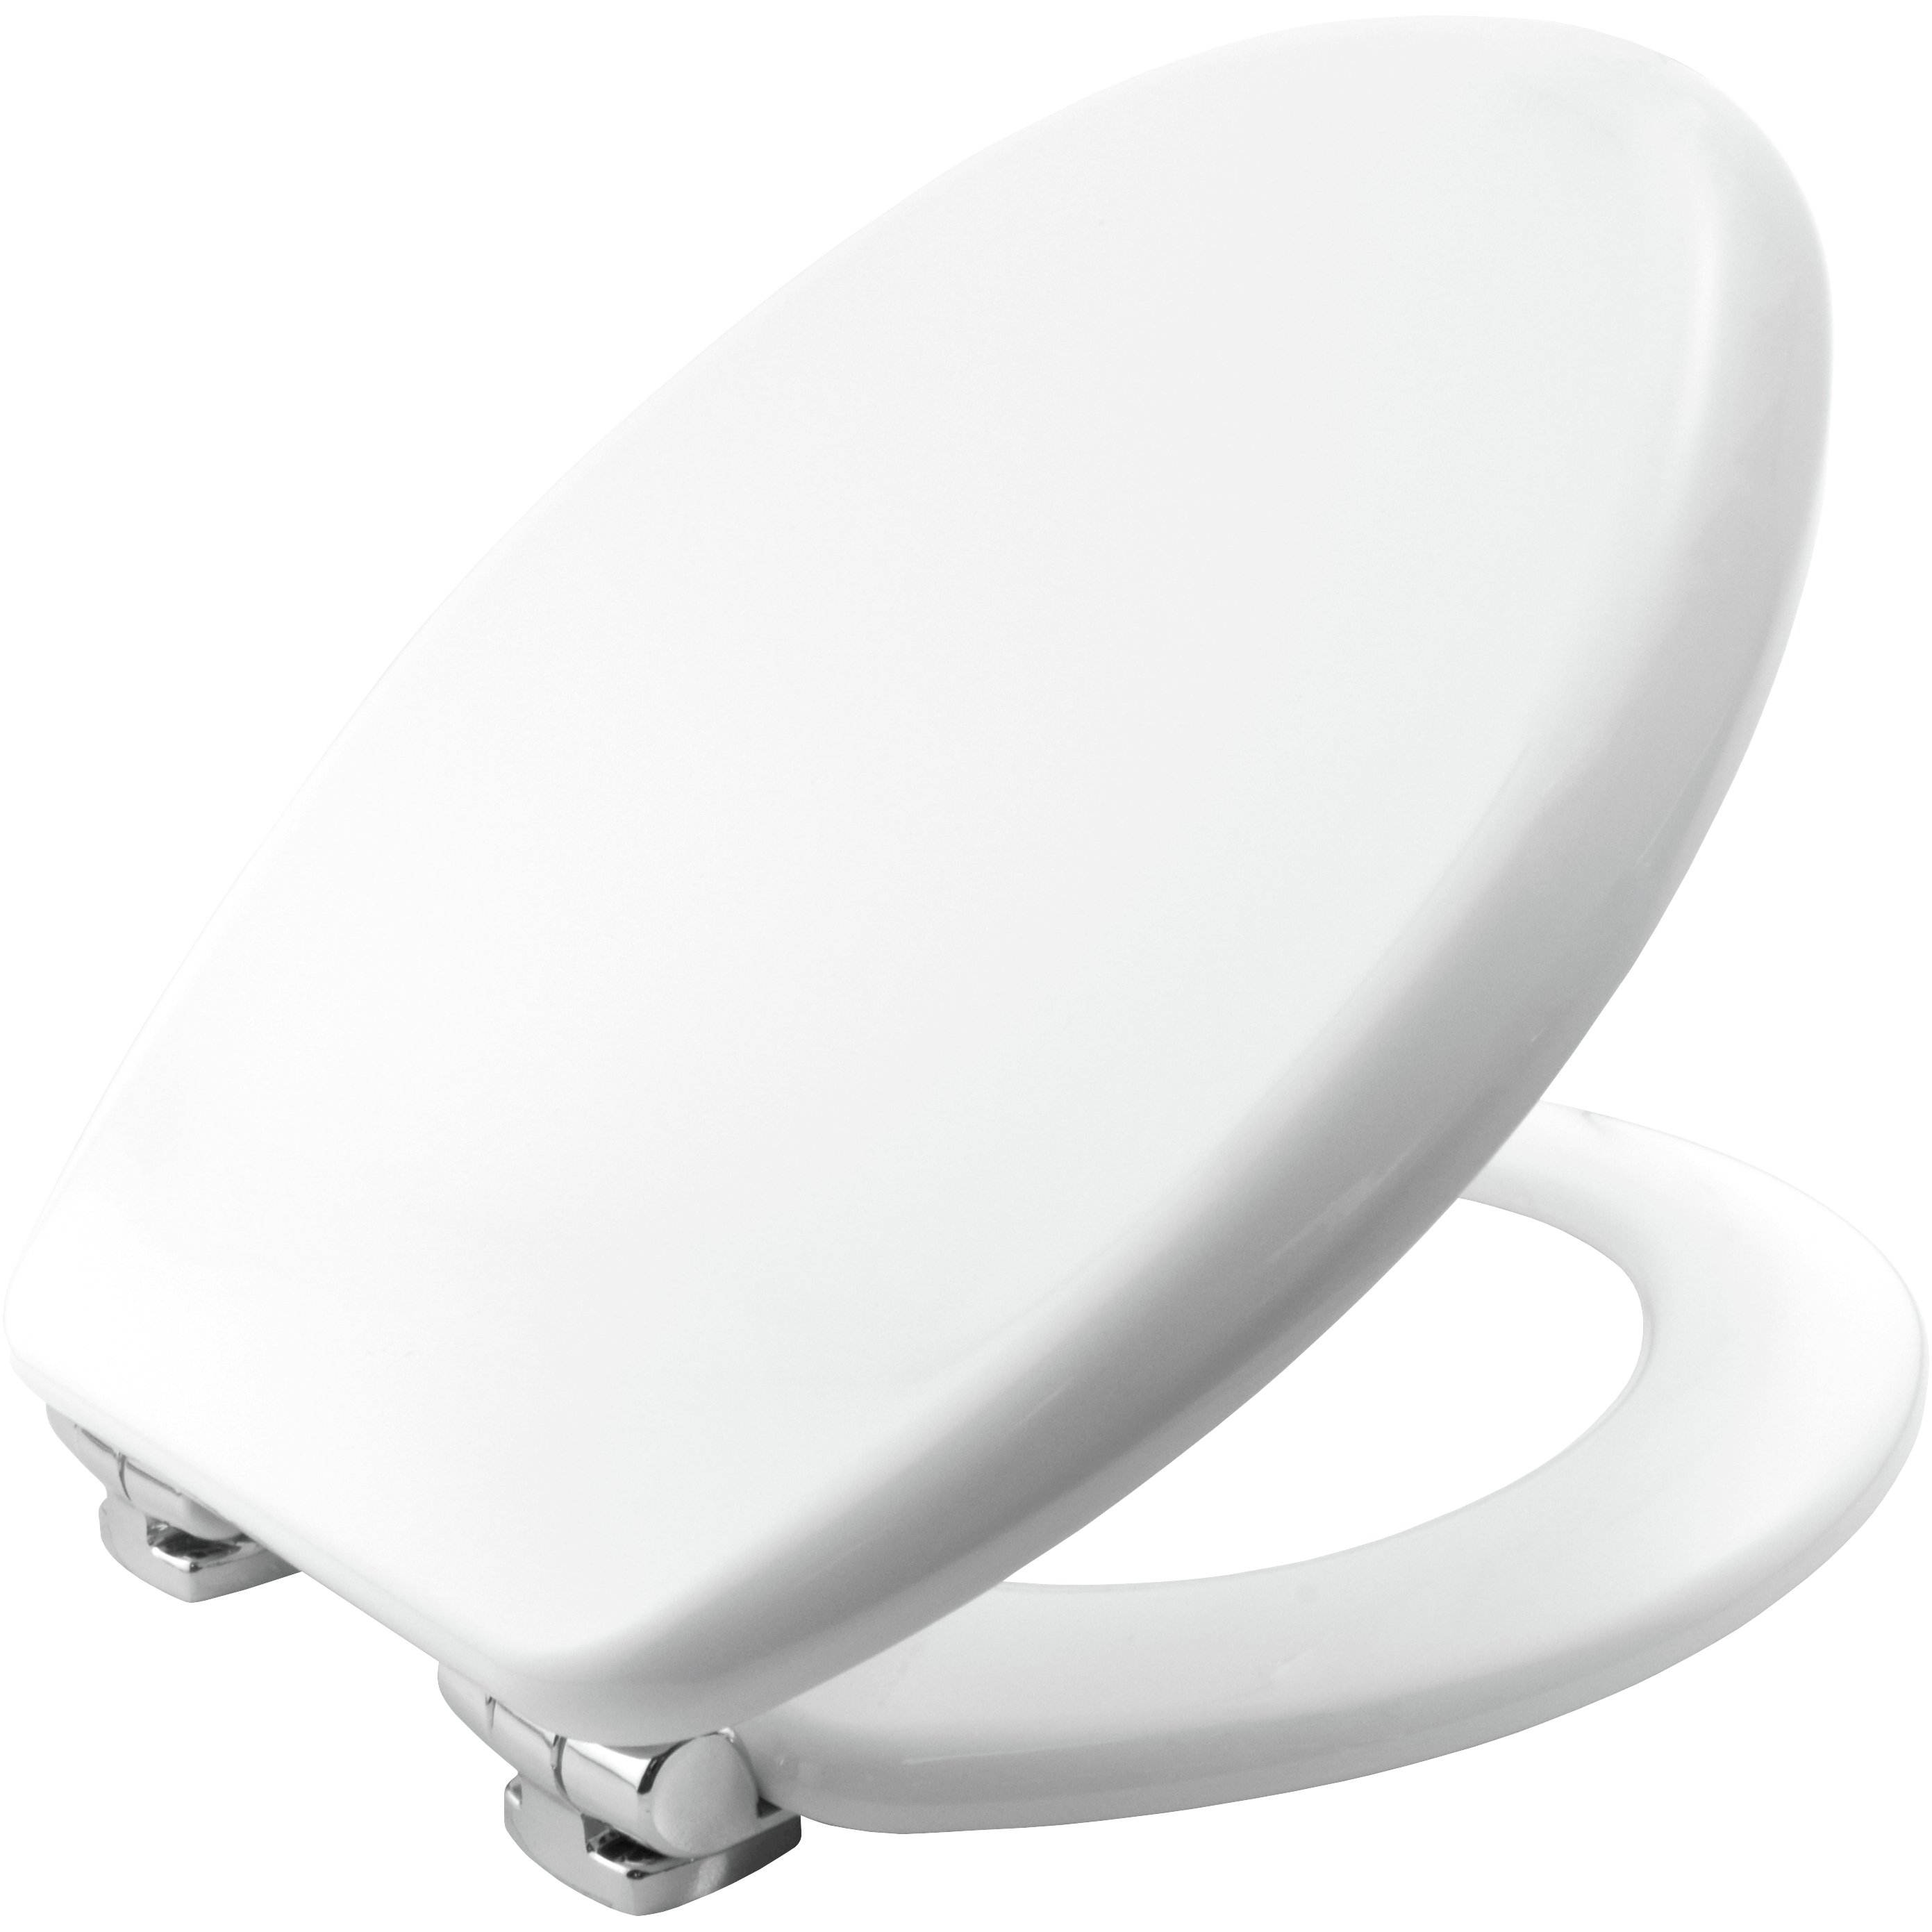 bemis vegas moulded wood slowly closing toilet seat white. Black Bedroom Furniture Sets. Home Design Ideas